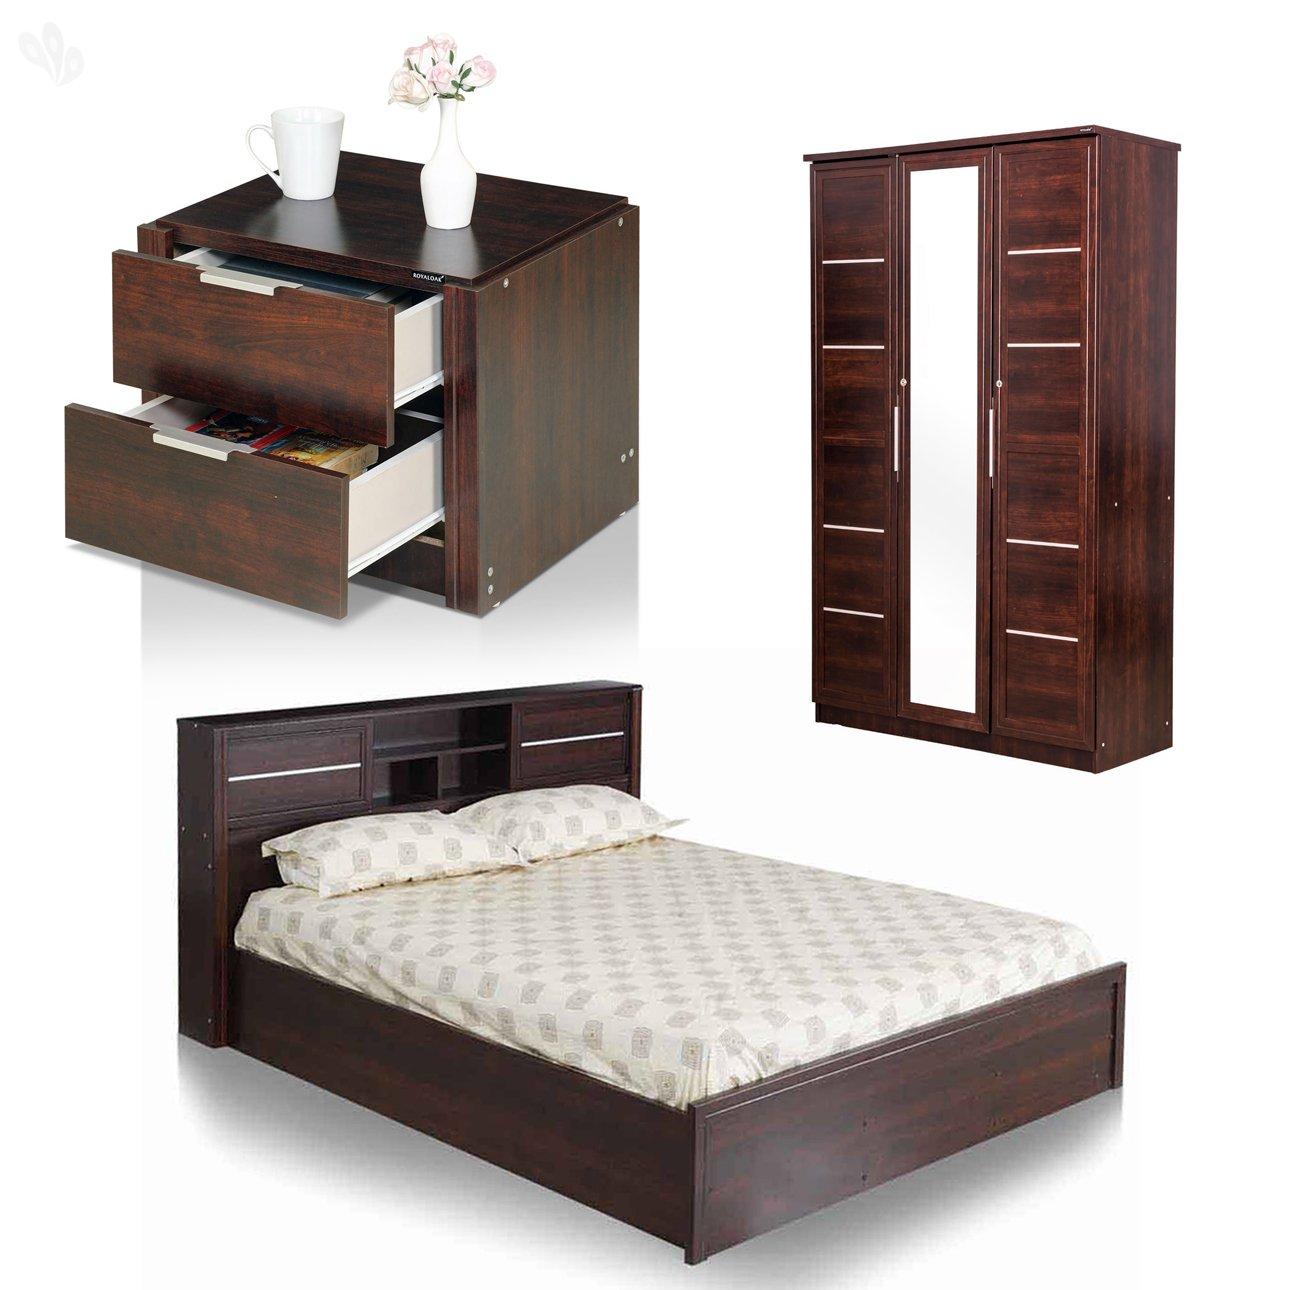 size 40 88099 c7185 Royal Oak Milan Bedroom Set with Queen Bed, 3 Door-Wardrobe and Bedside  Table (Walnut)